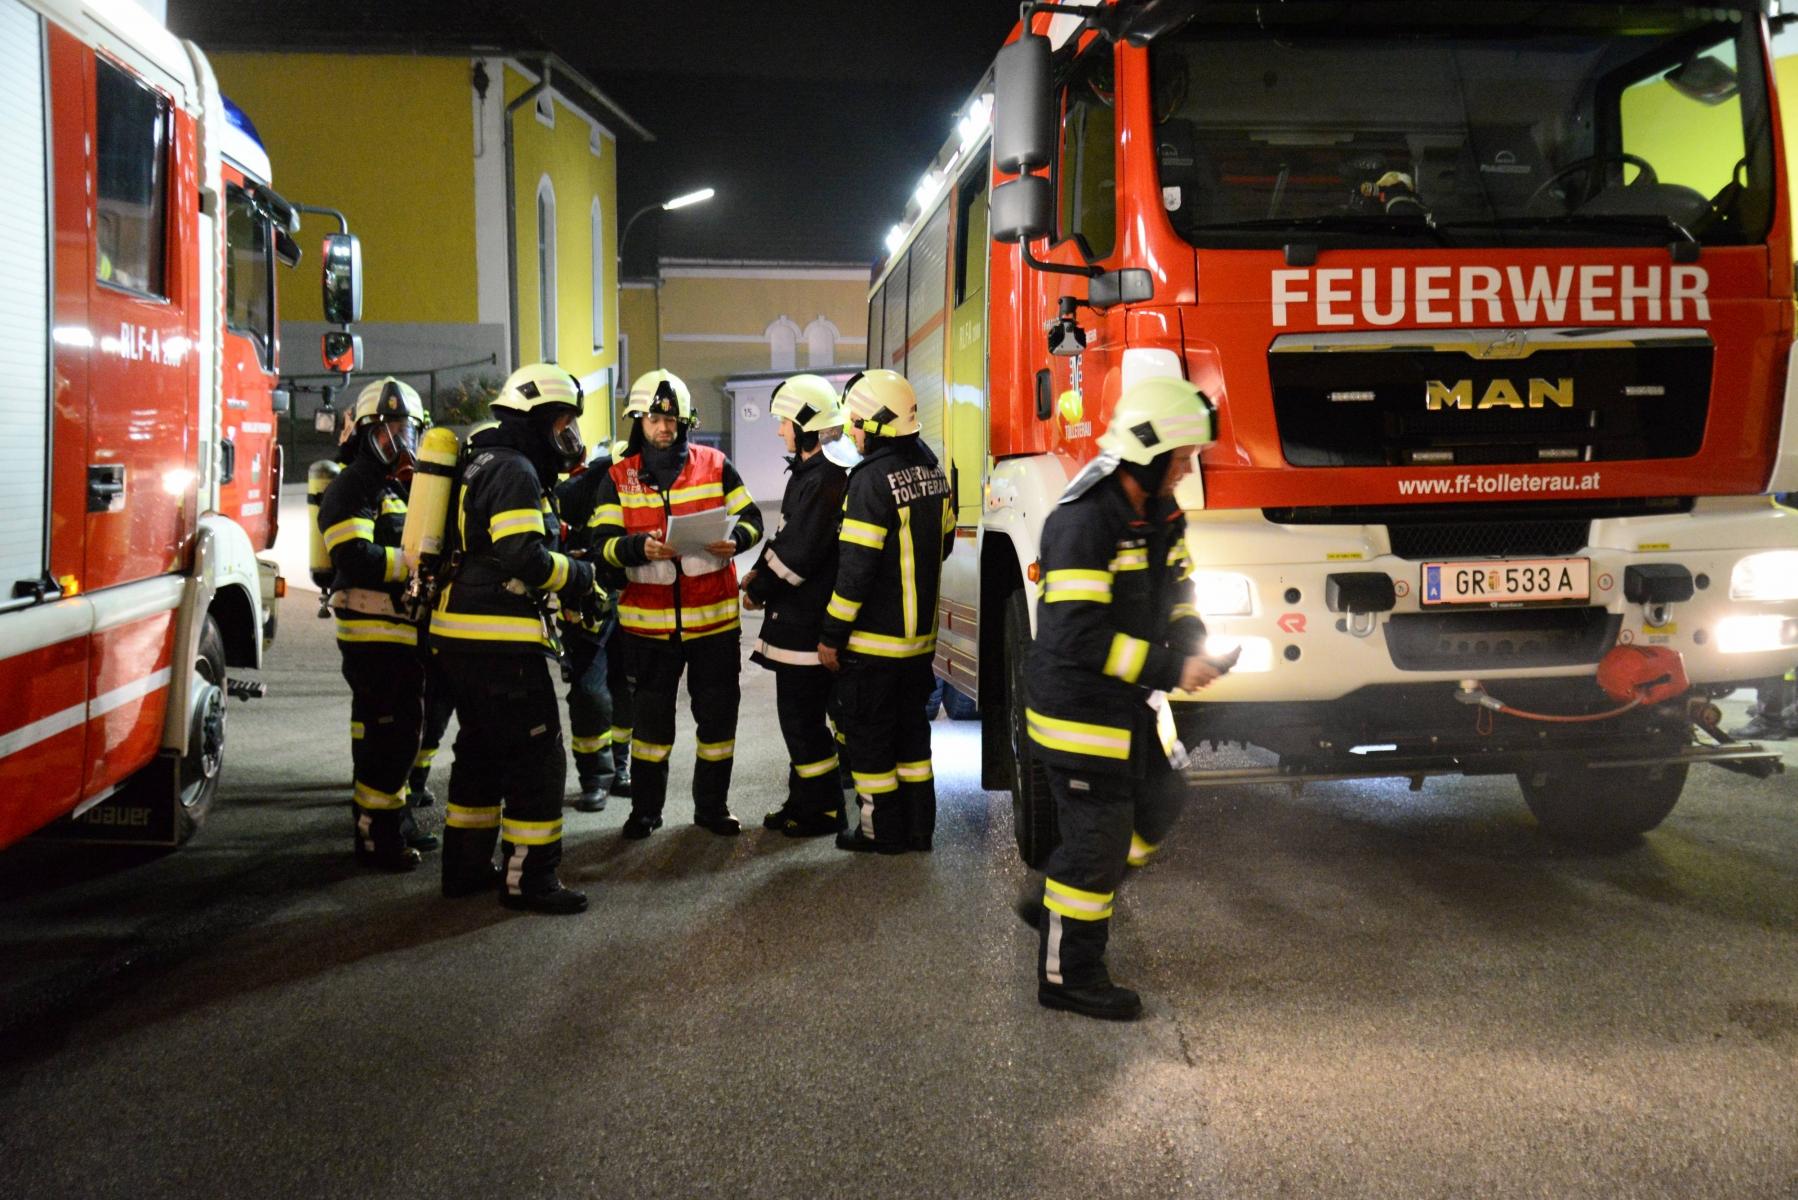 FF_Uebung_Brauerei_GR_0070